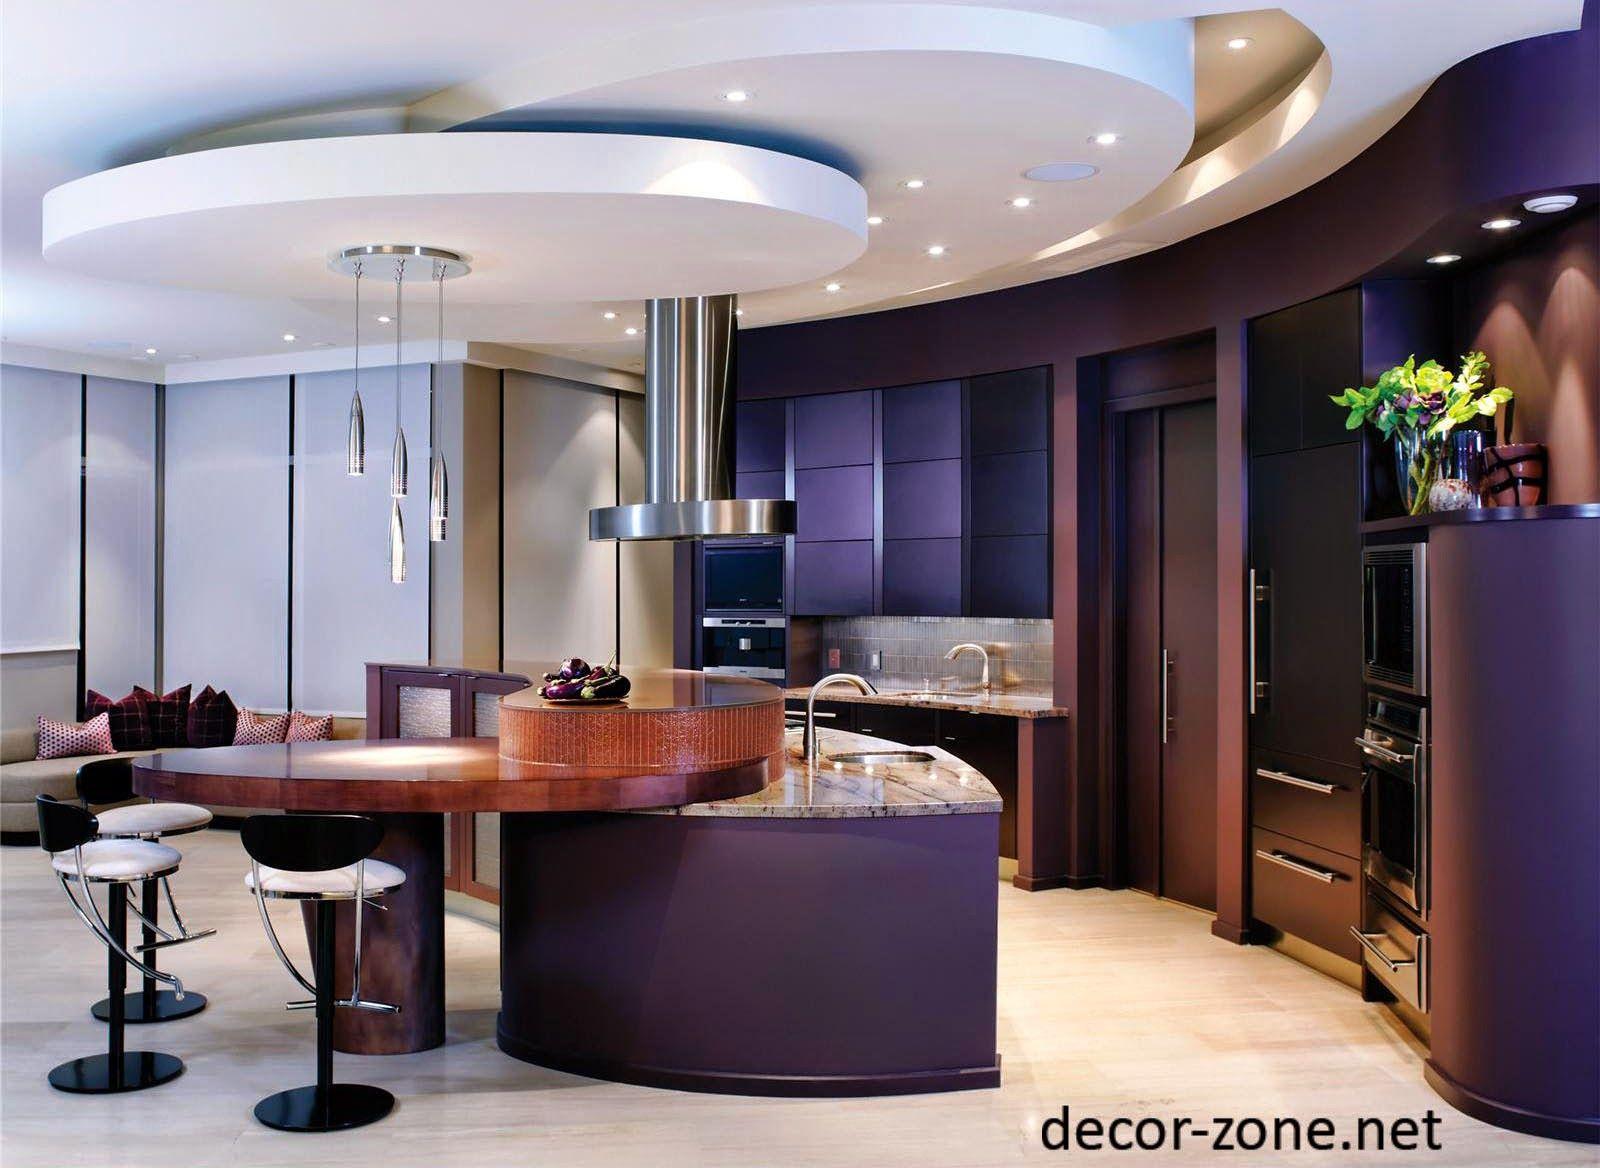 kitchen ceiling ideas, gypsum false ceiling designs | futuristic